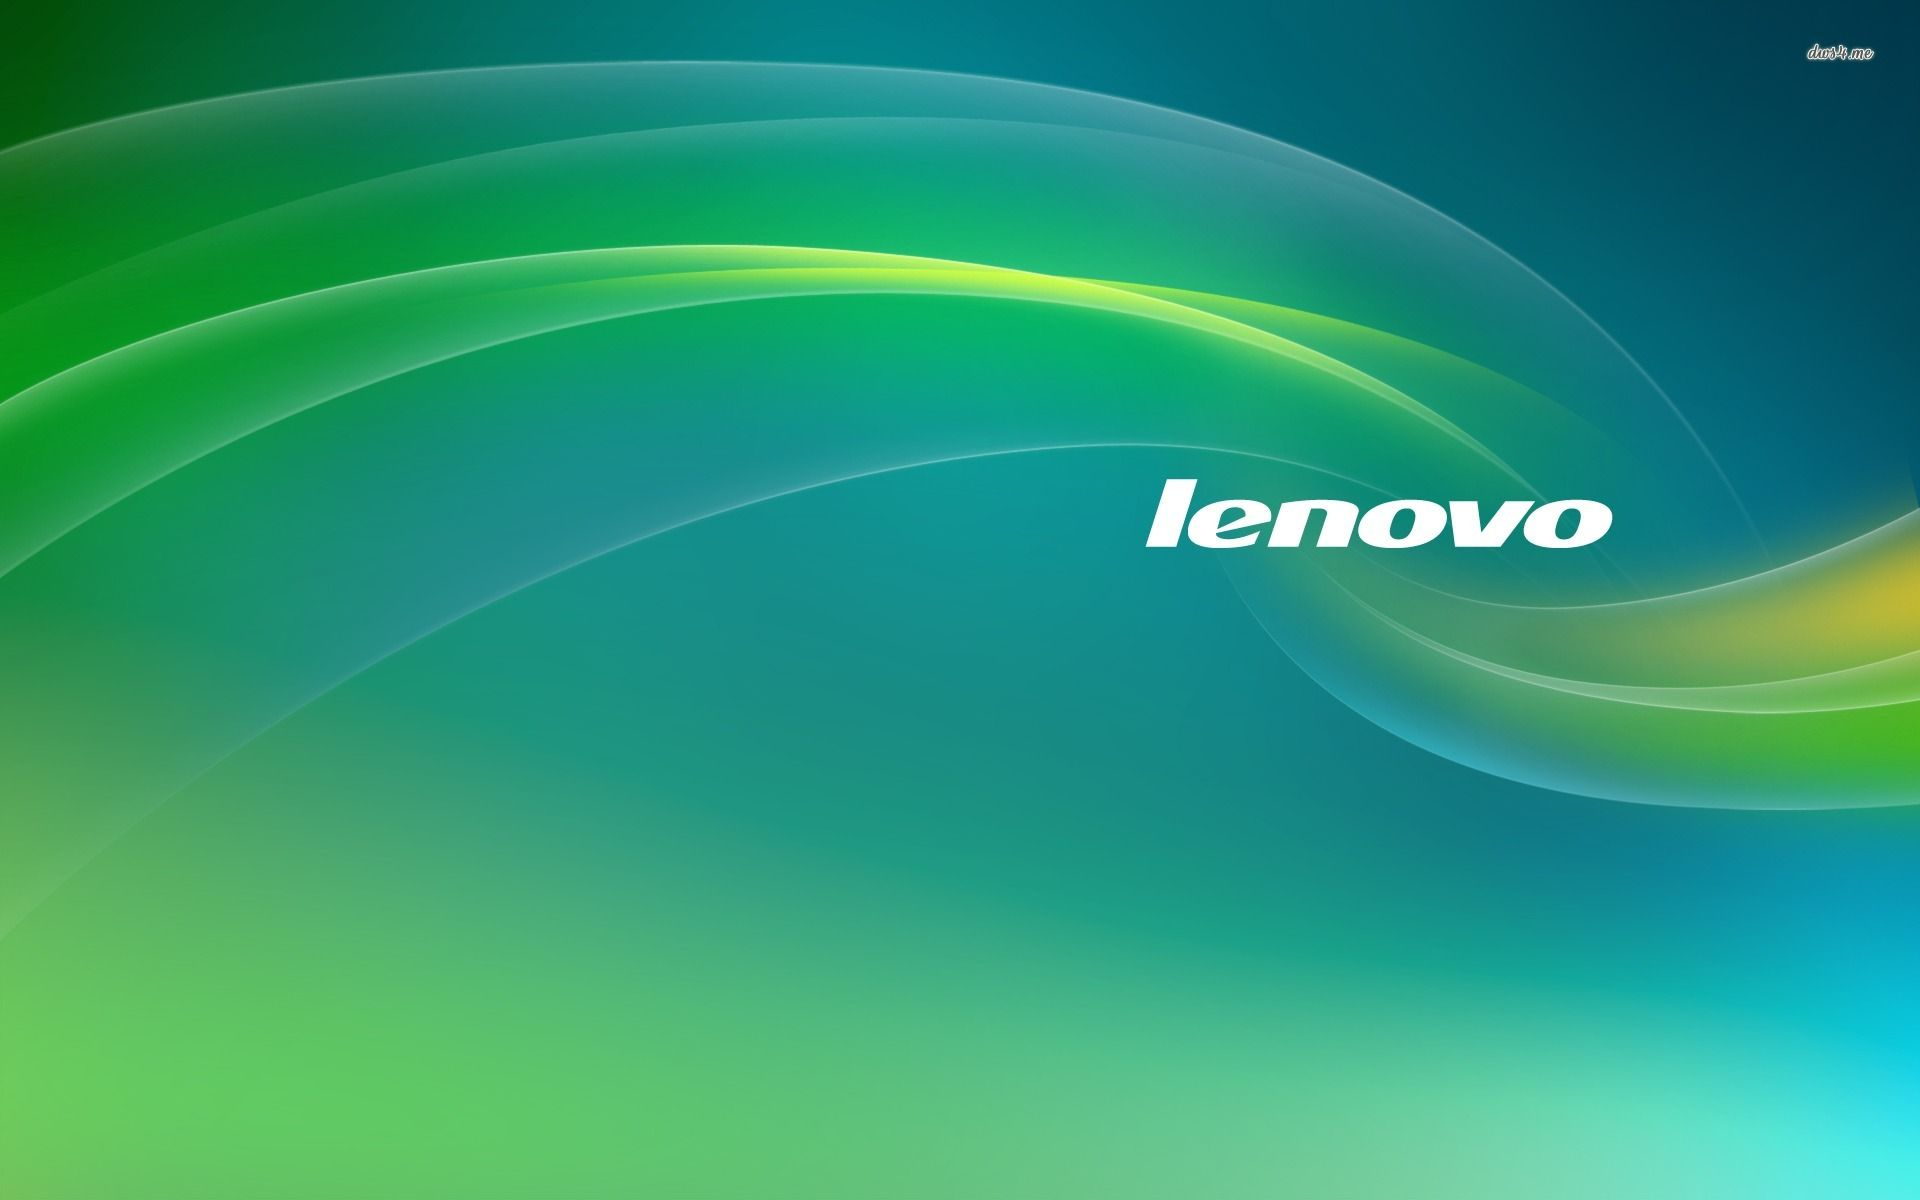 Lenovo 3K Wallpapers   Top Lenovo 3K Backgrounds 1920x1200